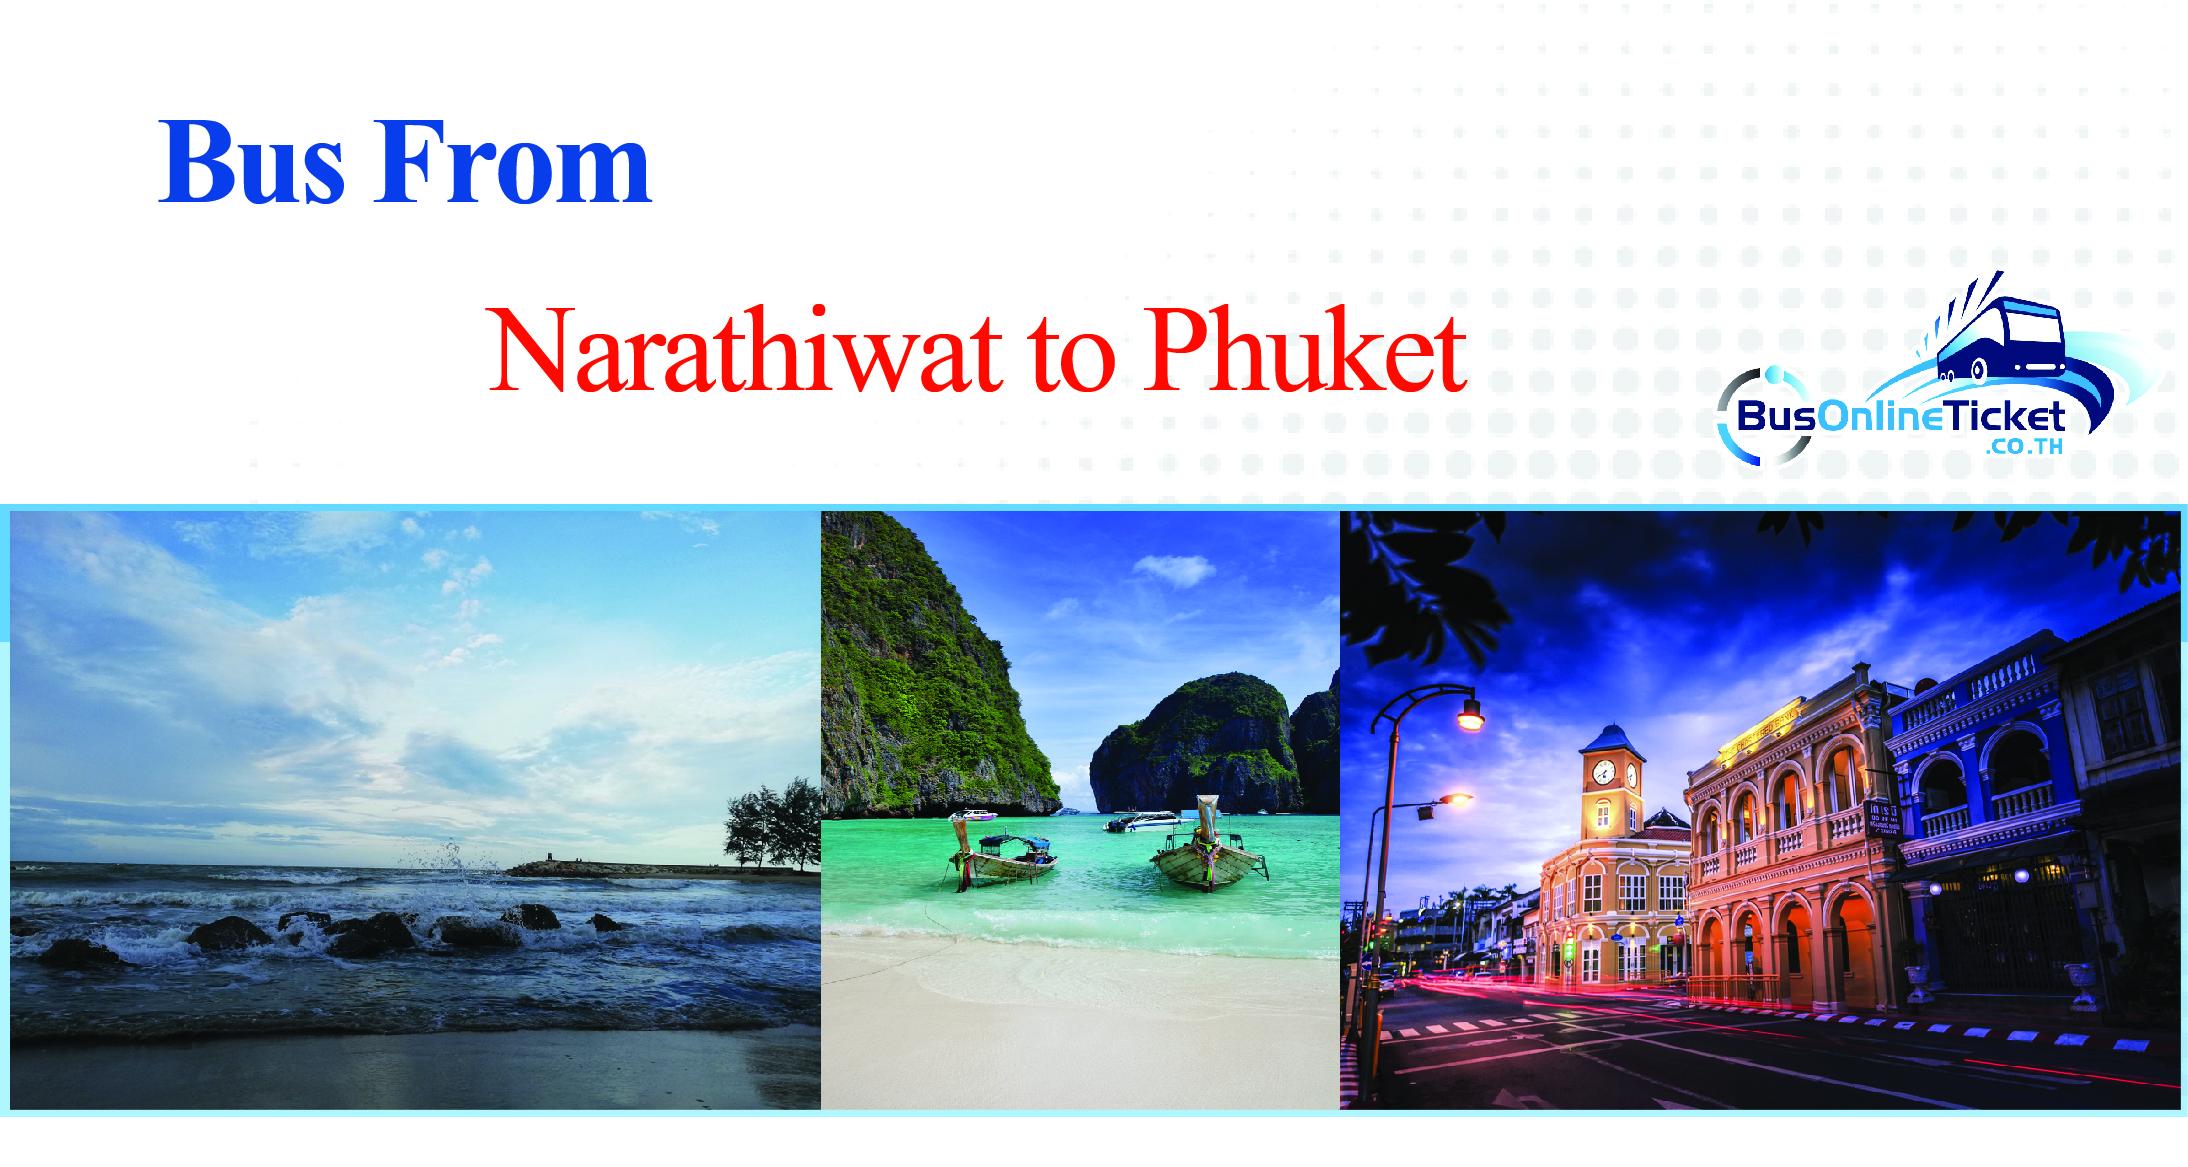 Narathiwat to Phuket